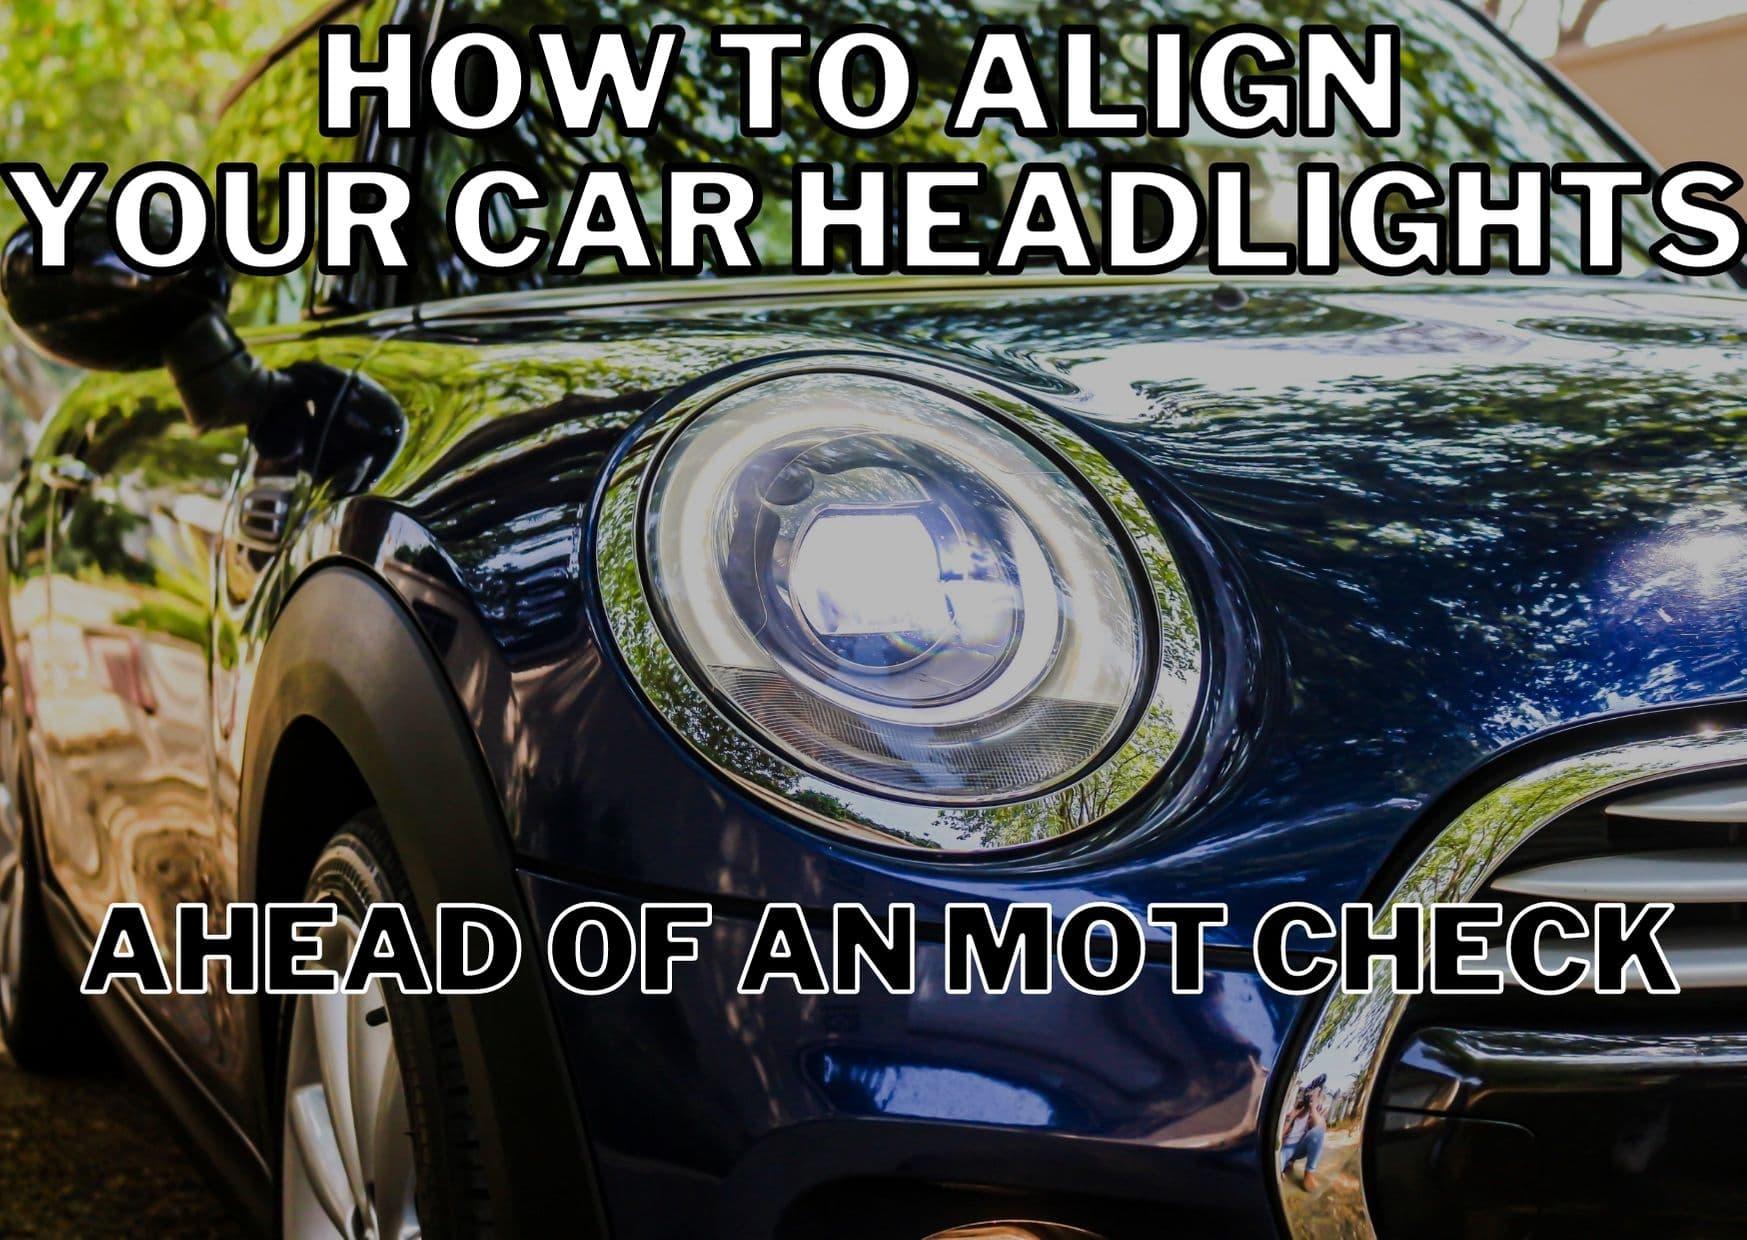 align car headlights